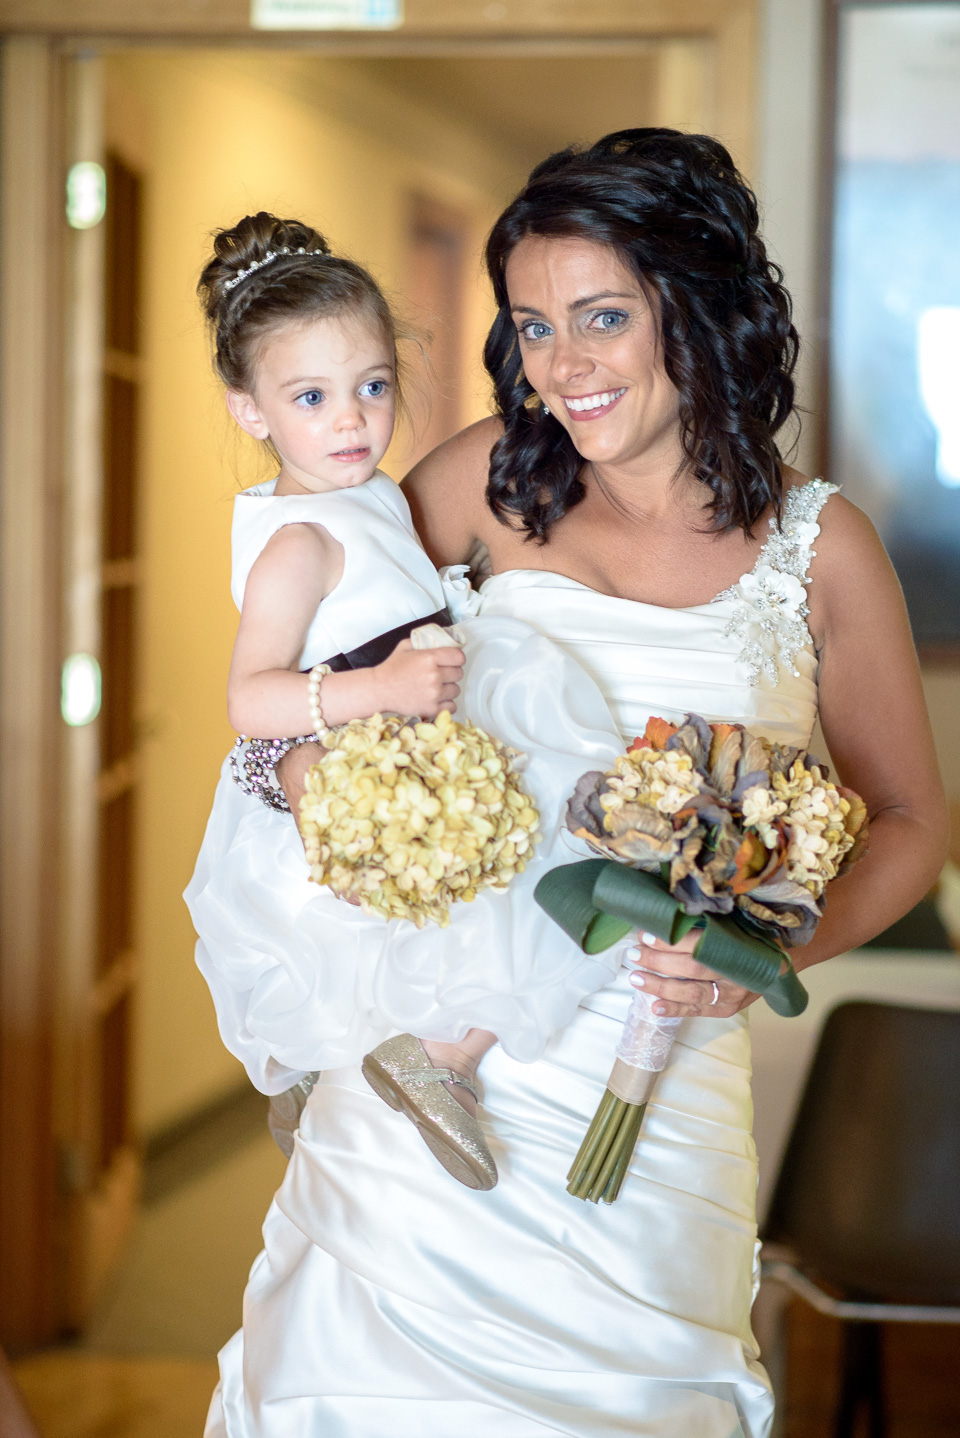 NIgel Fearon Photography | The LeBlanc Wedding-38.jpg